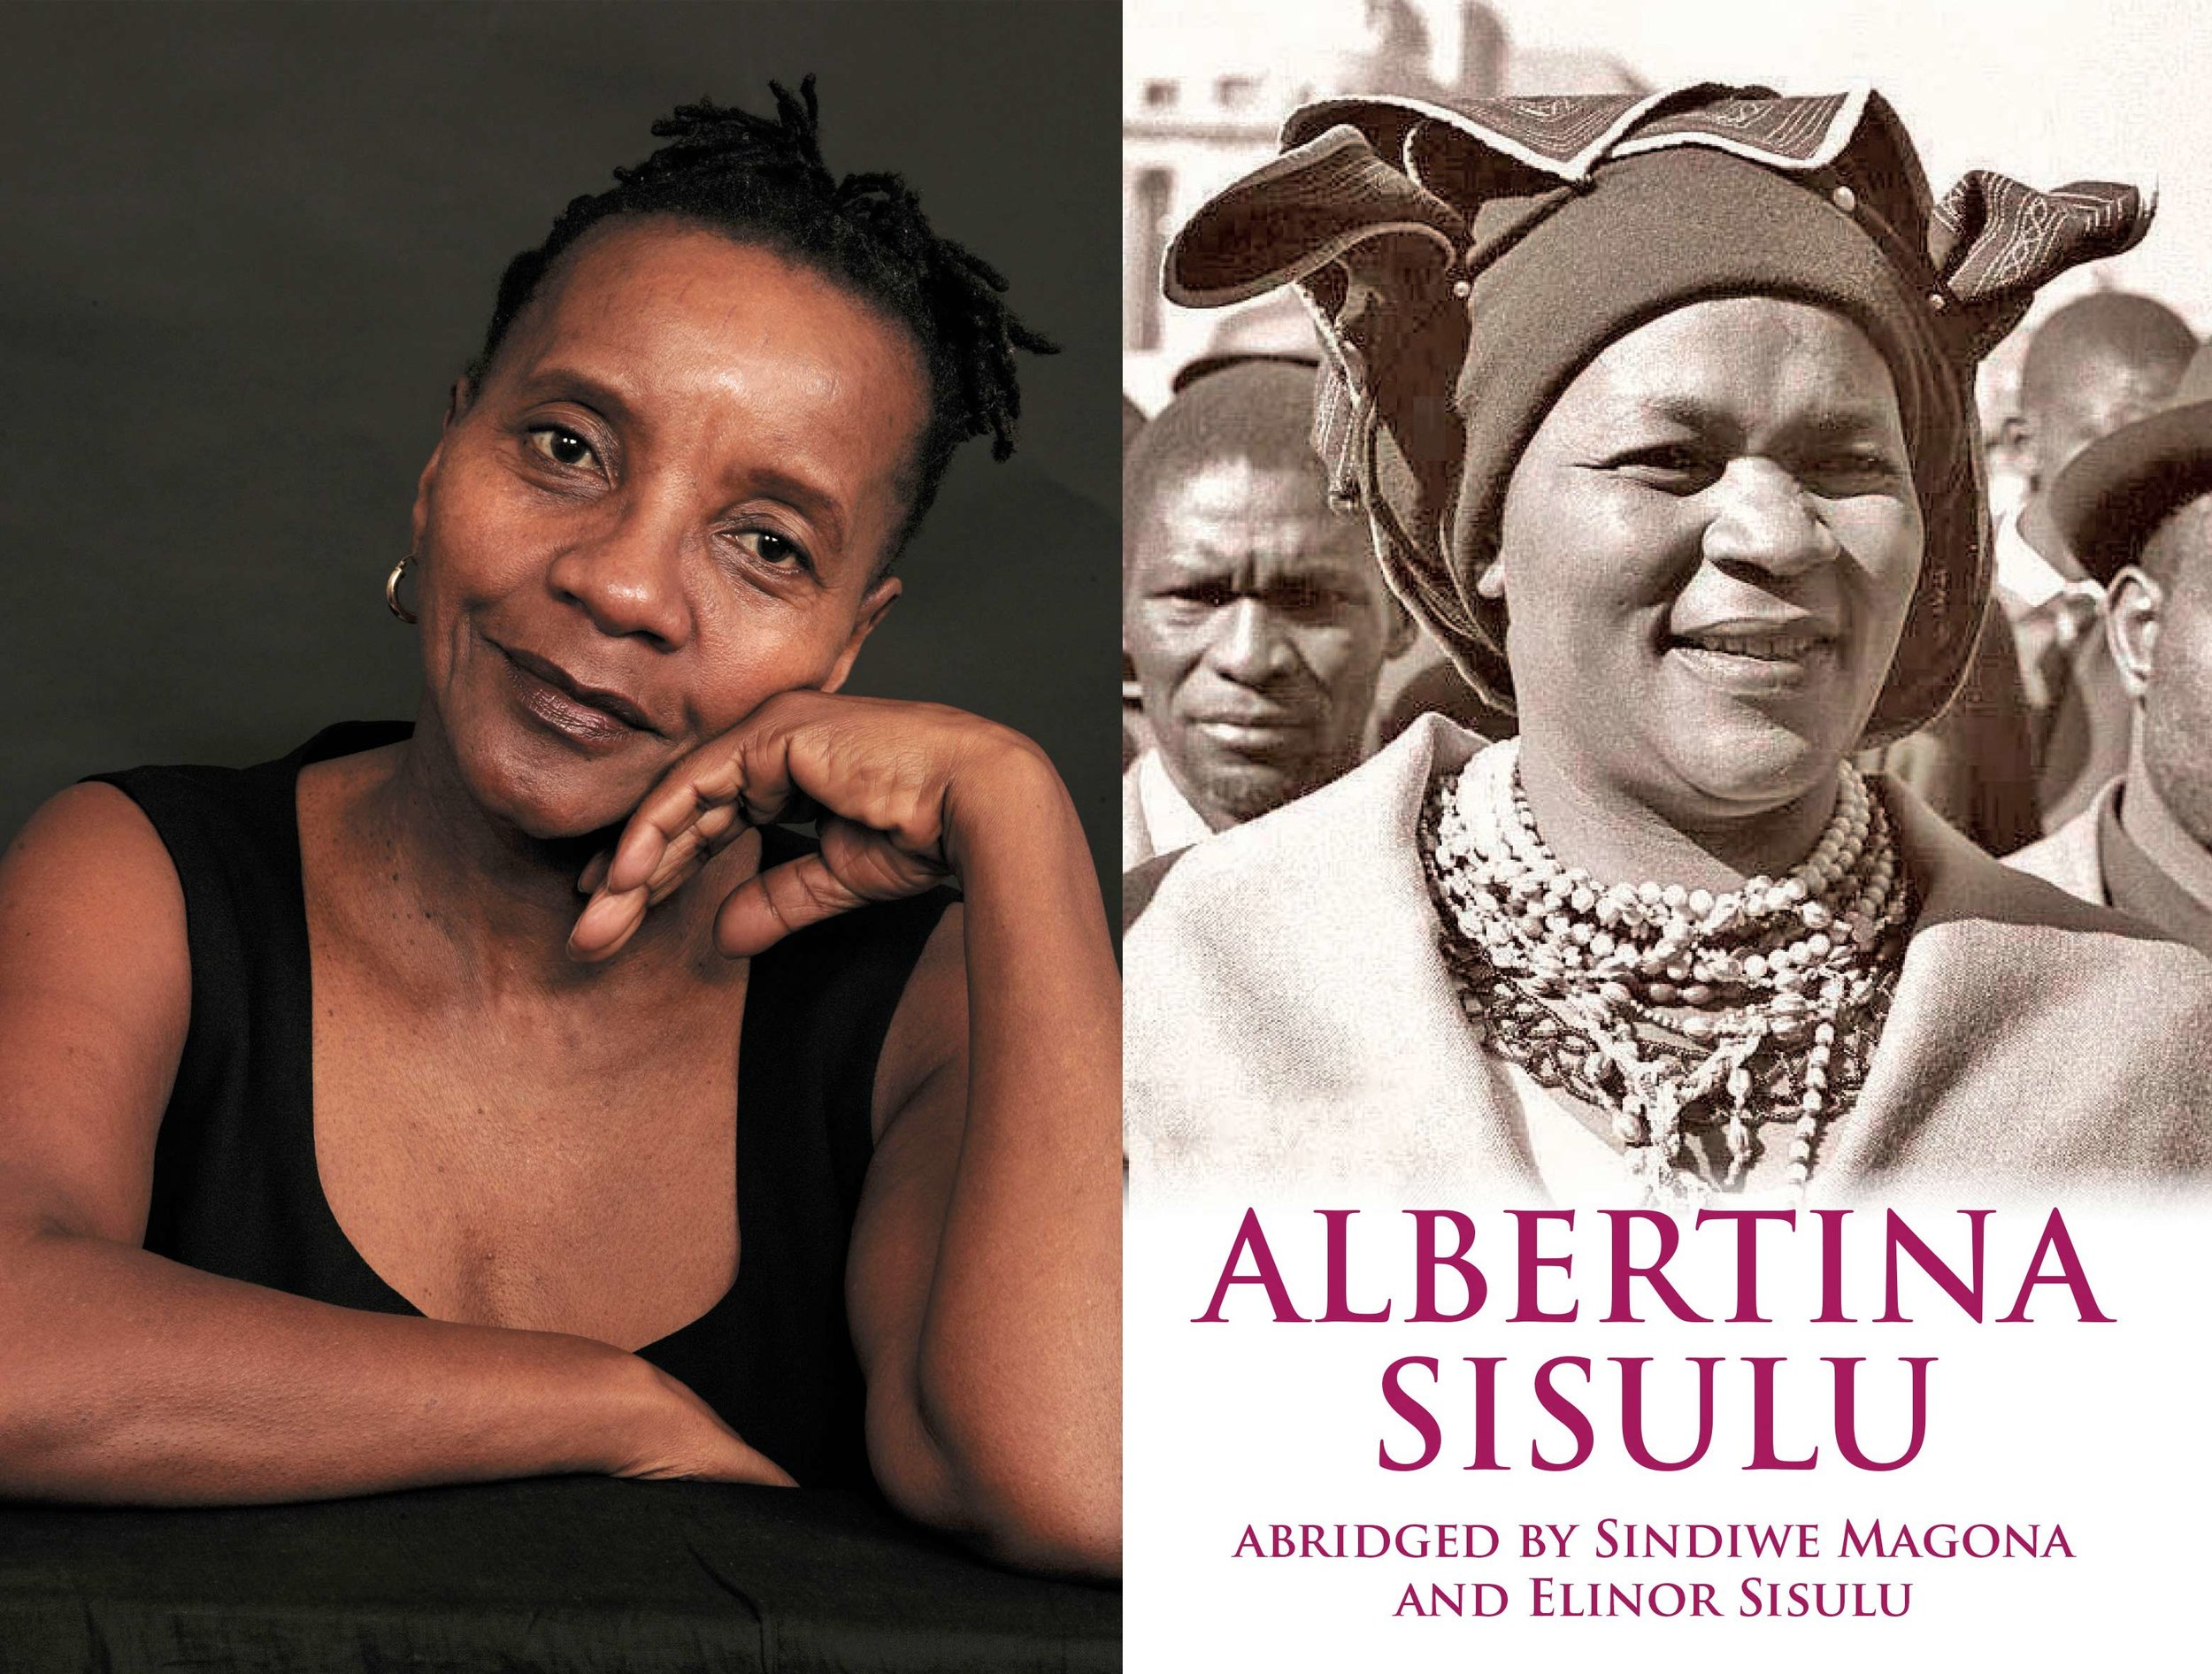 Sindiwe Magona Albertina Sisulu memoir Buy Online New Africa Books